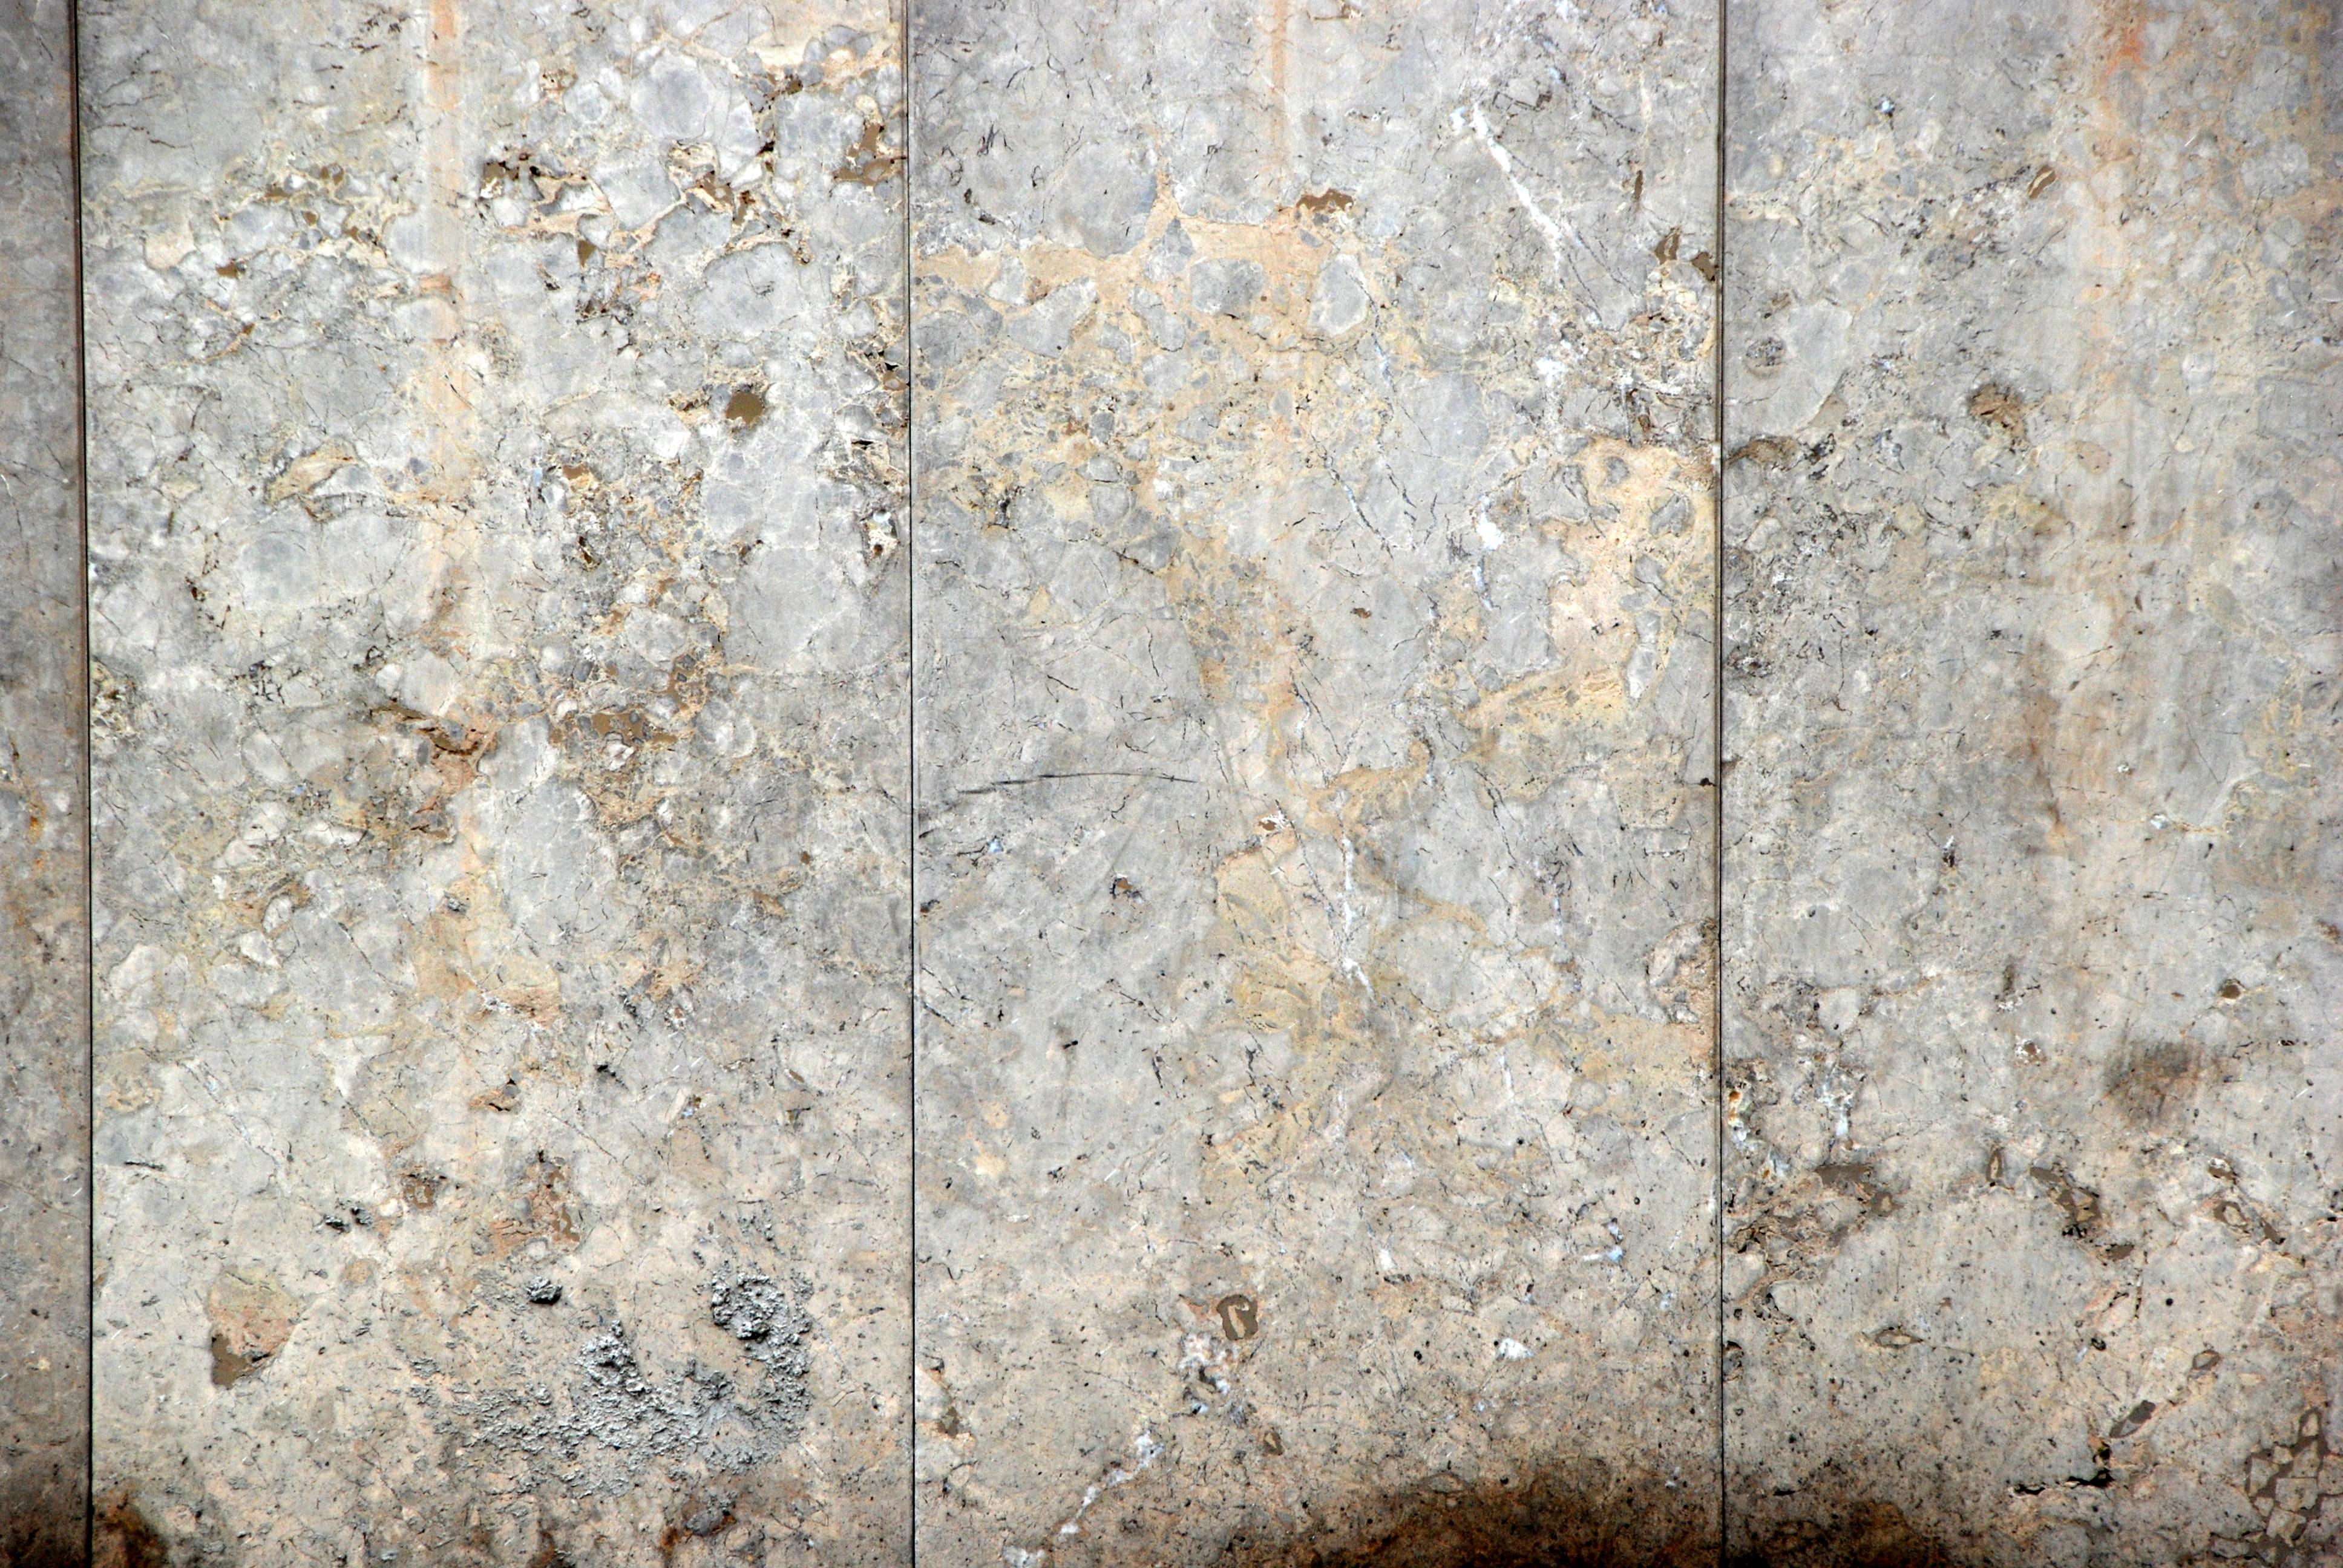 M rmol sucio canarias creativa for Concepto de marmol